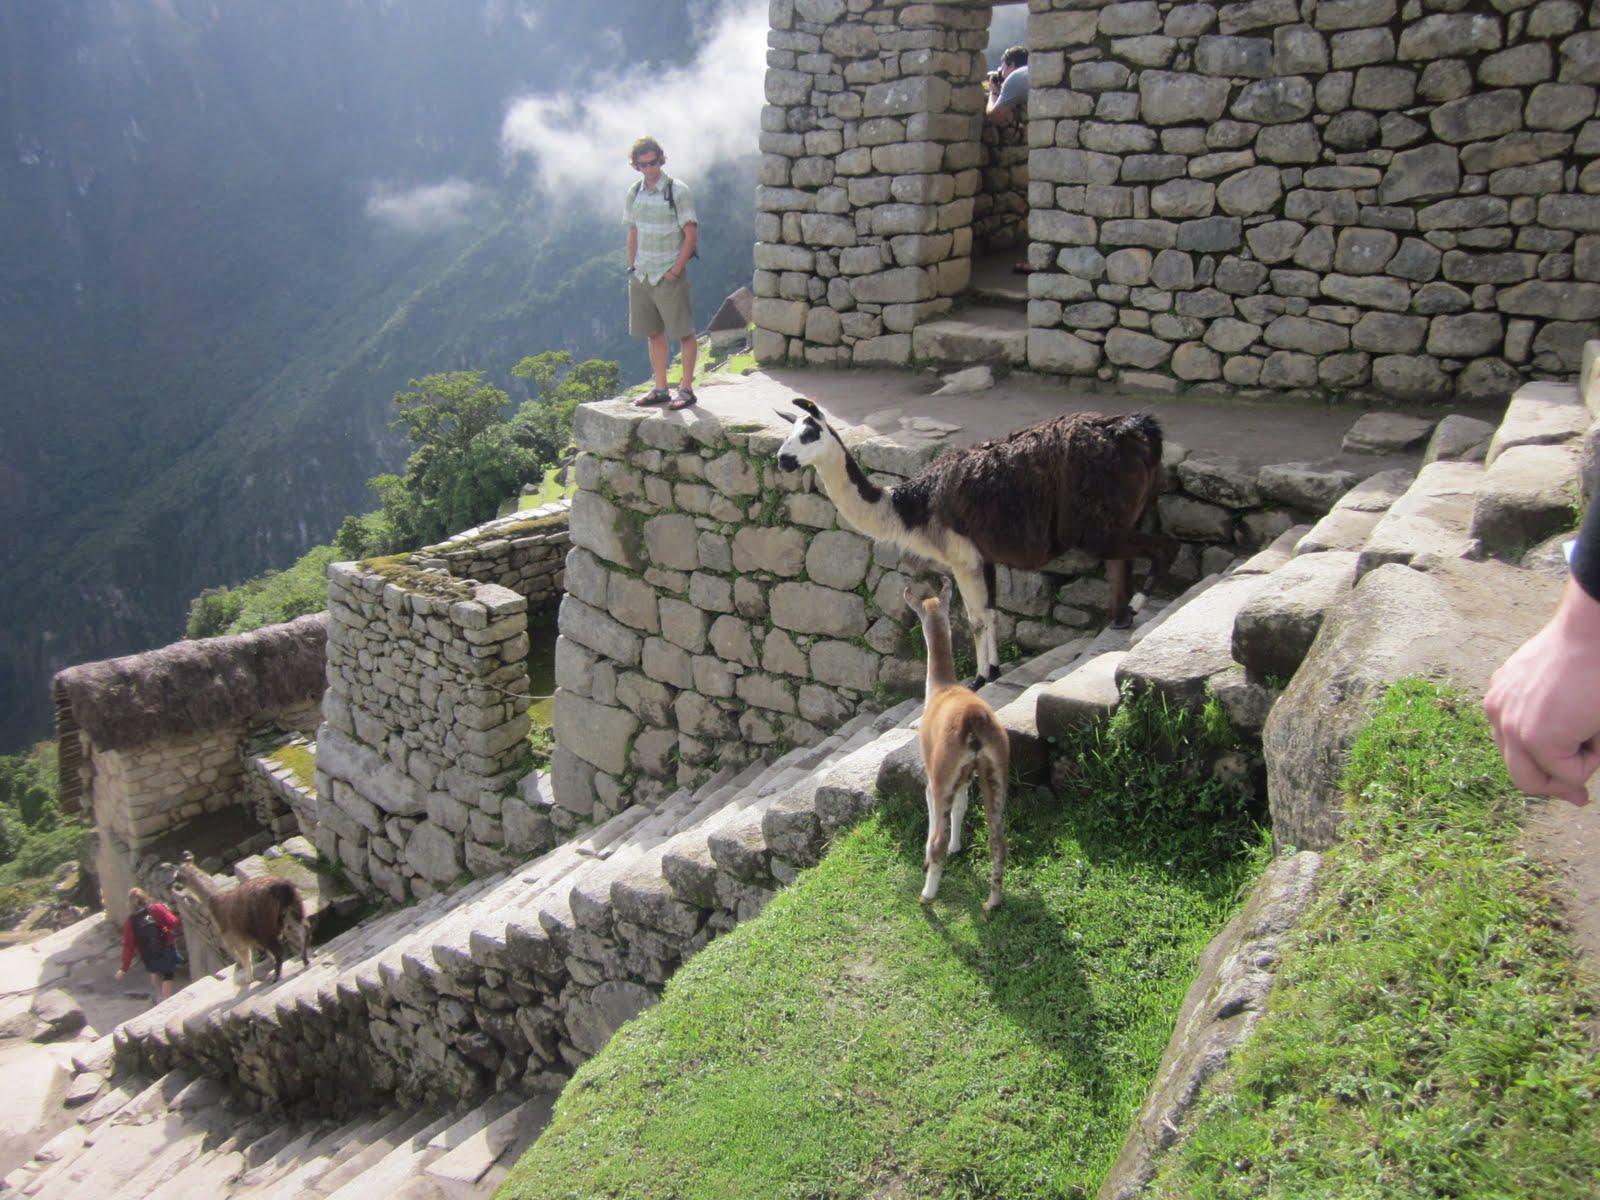 touring ruins